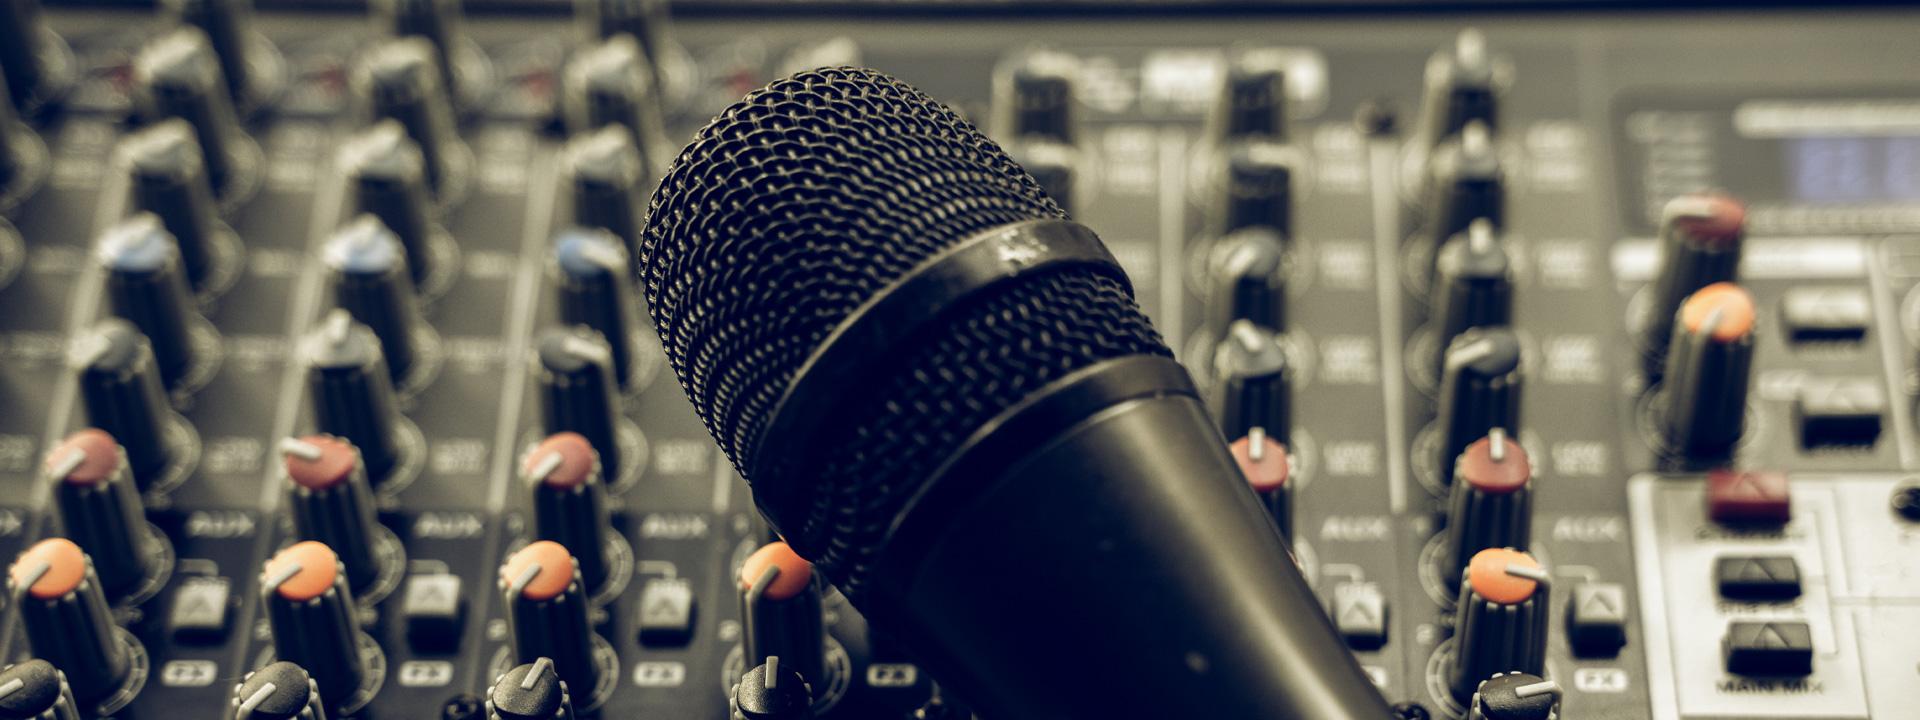 Microfono su mixer danny dj matrimonio